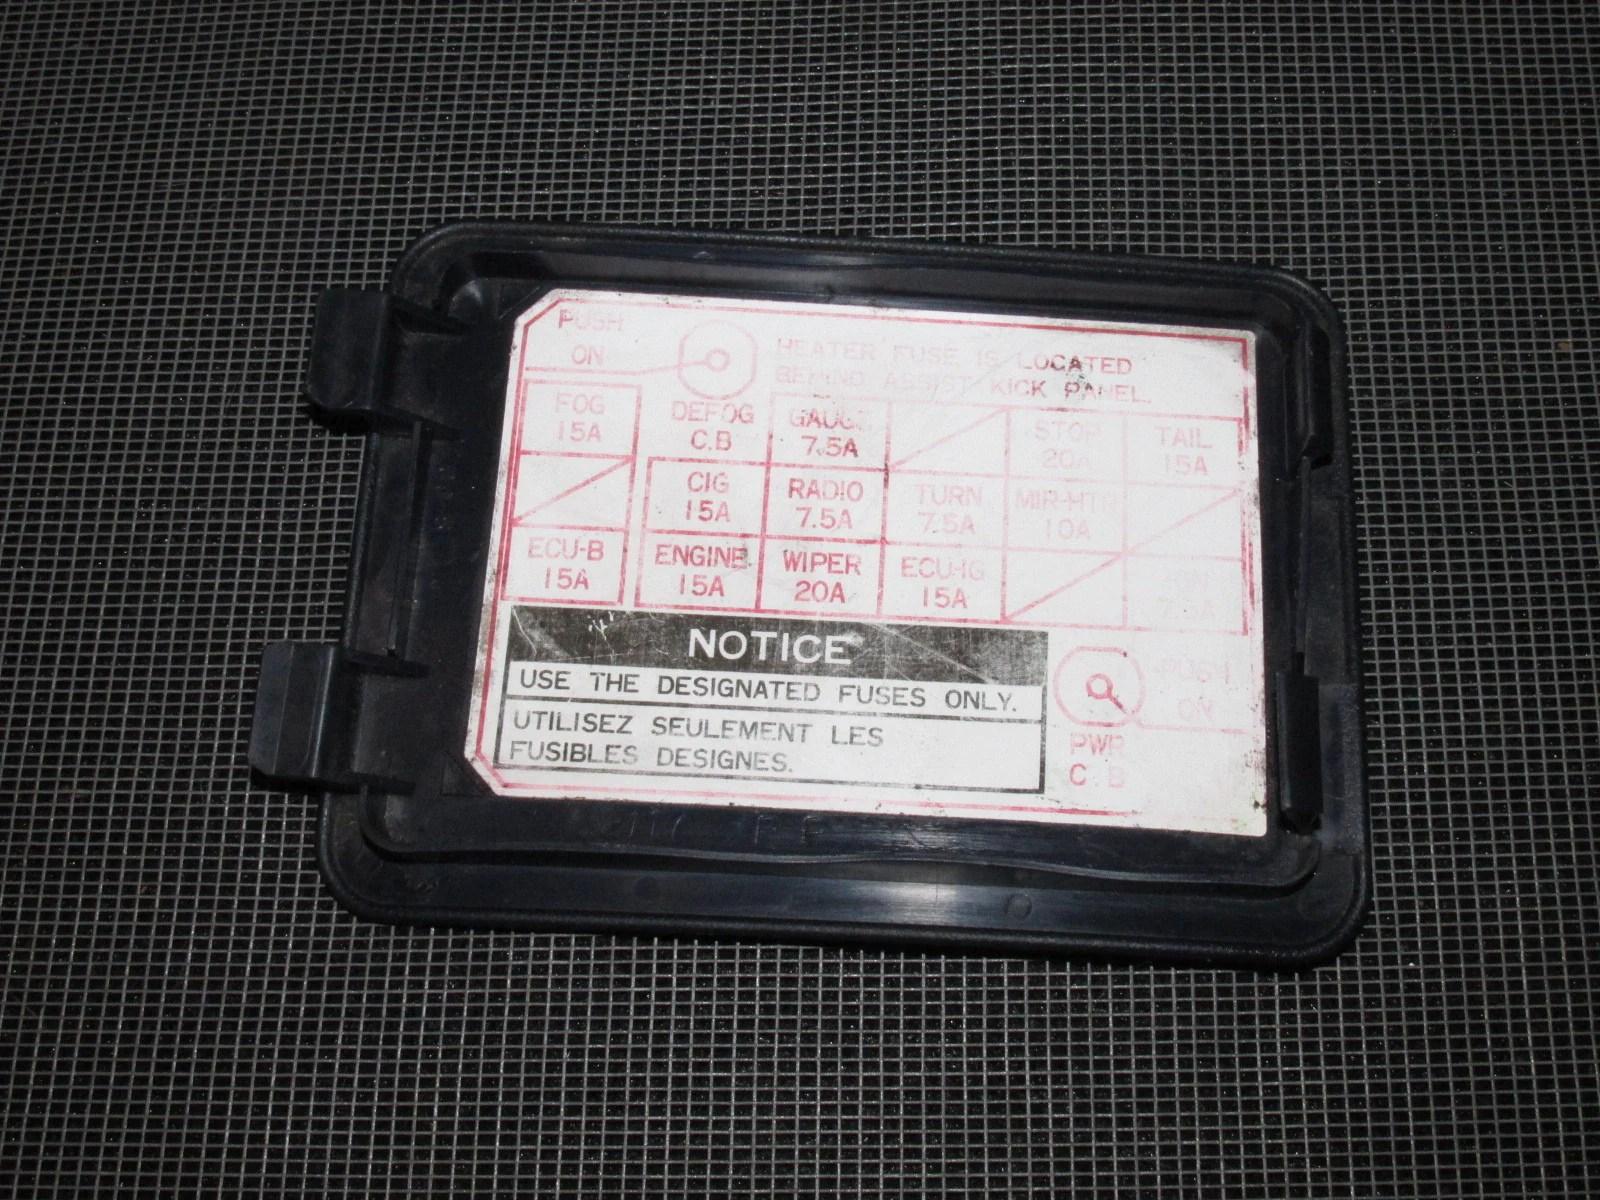 89 toyota fuse box diy wiring diagrams u2022 1997 toyota camry fuse box diagram 1989 [ 1600 x 1200 Pixel ]